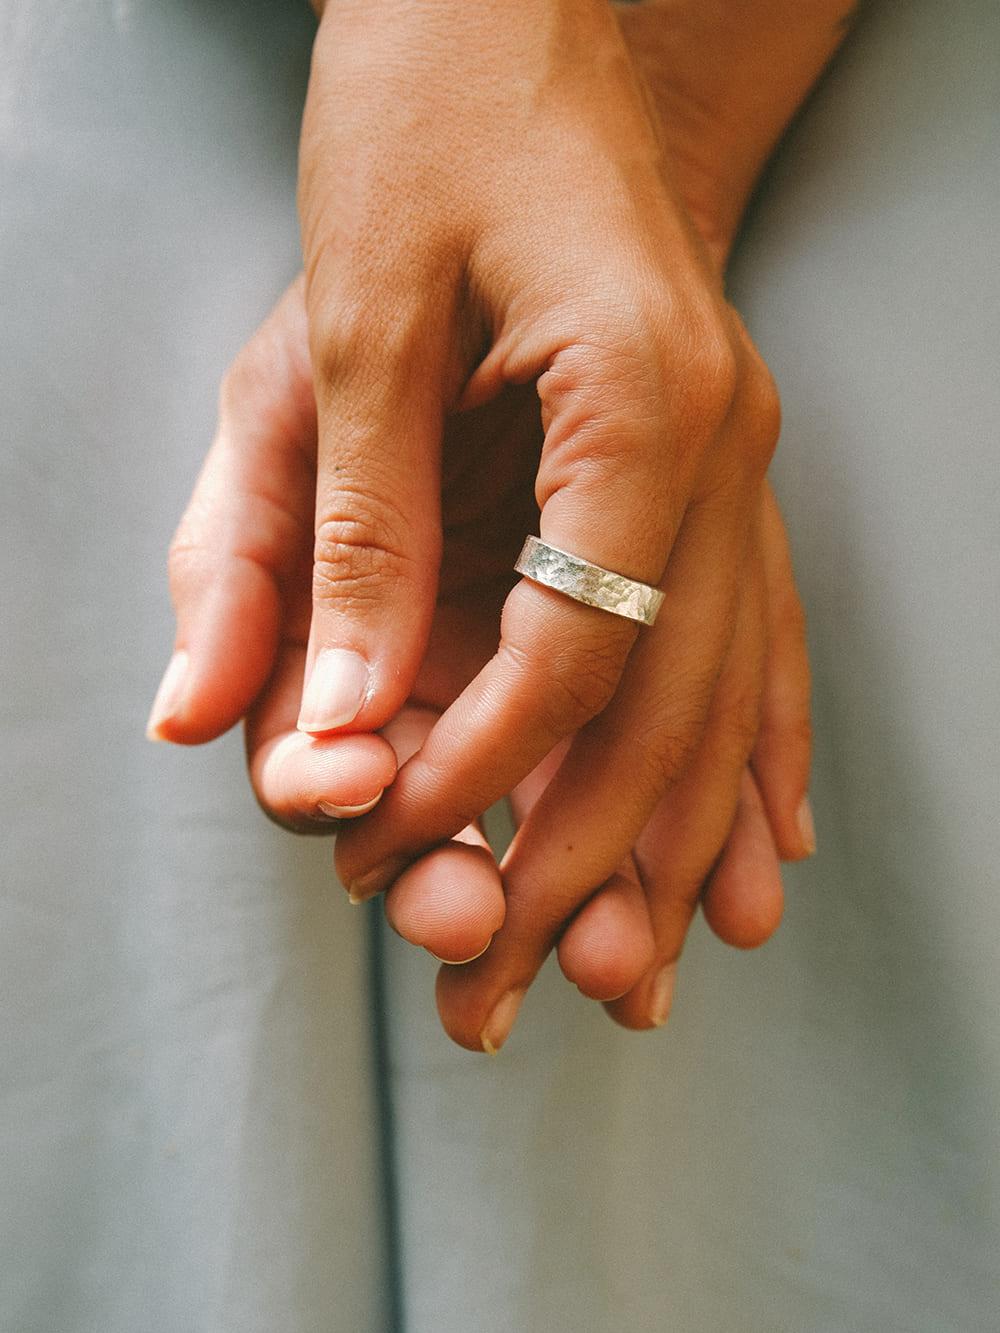 anillo de plata para regalar, joyas pareja, joyas para enamorados, joyas dia de la madre, comprar anillo de plata